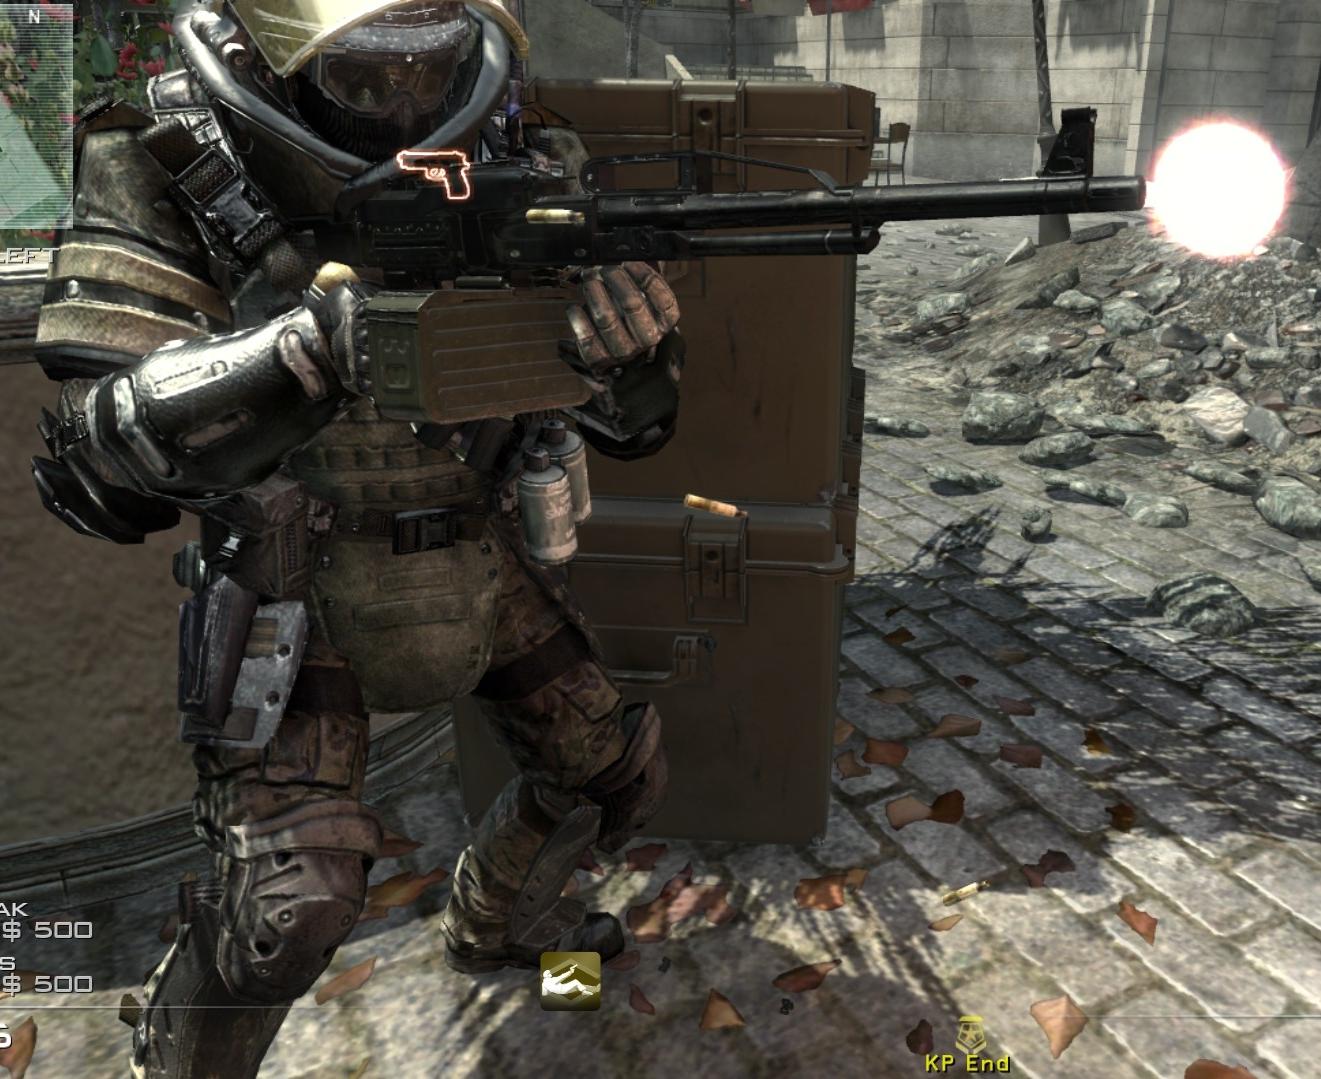 Juggernaut Call Of Duty Modern Warfare Vs Unsc Marine Corps And Orbital Drop Shock Troopers Halo Sufficient Velocity